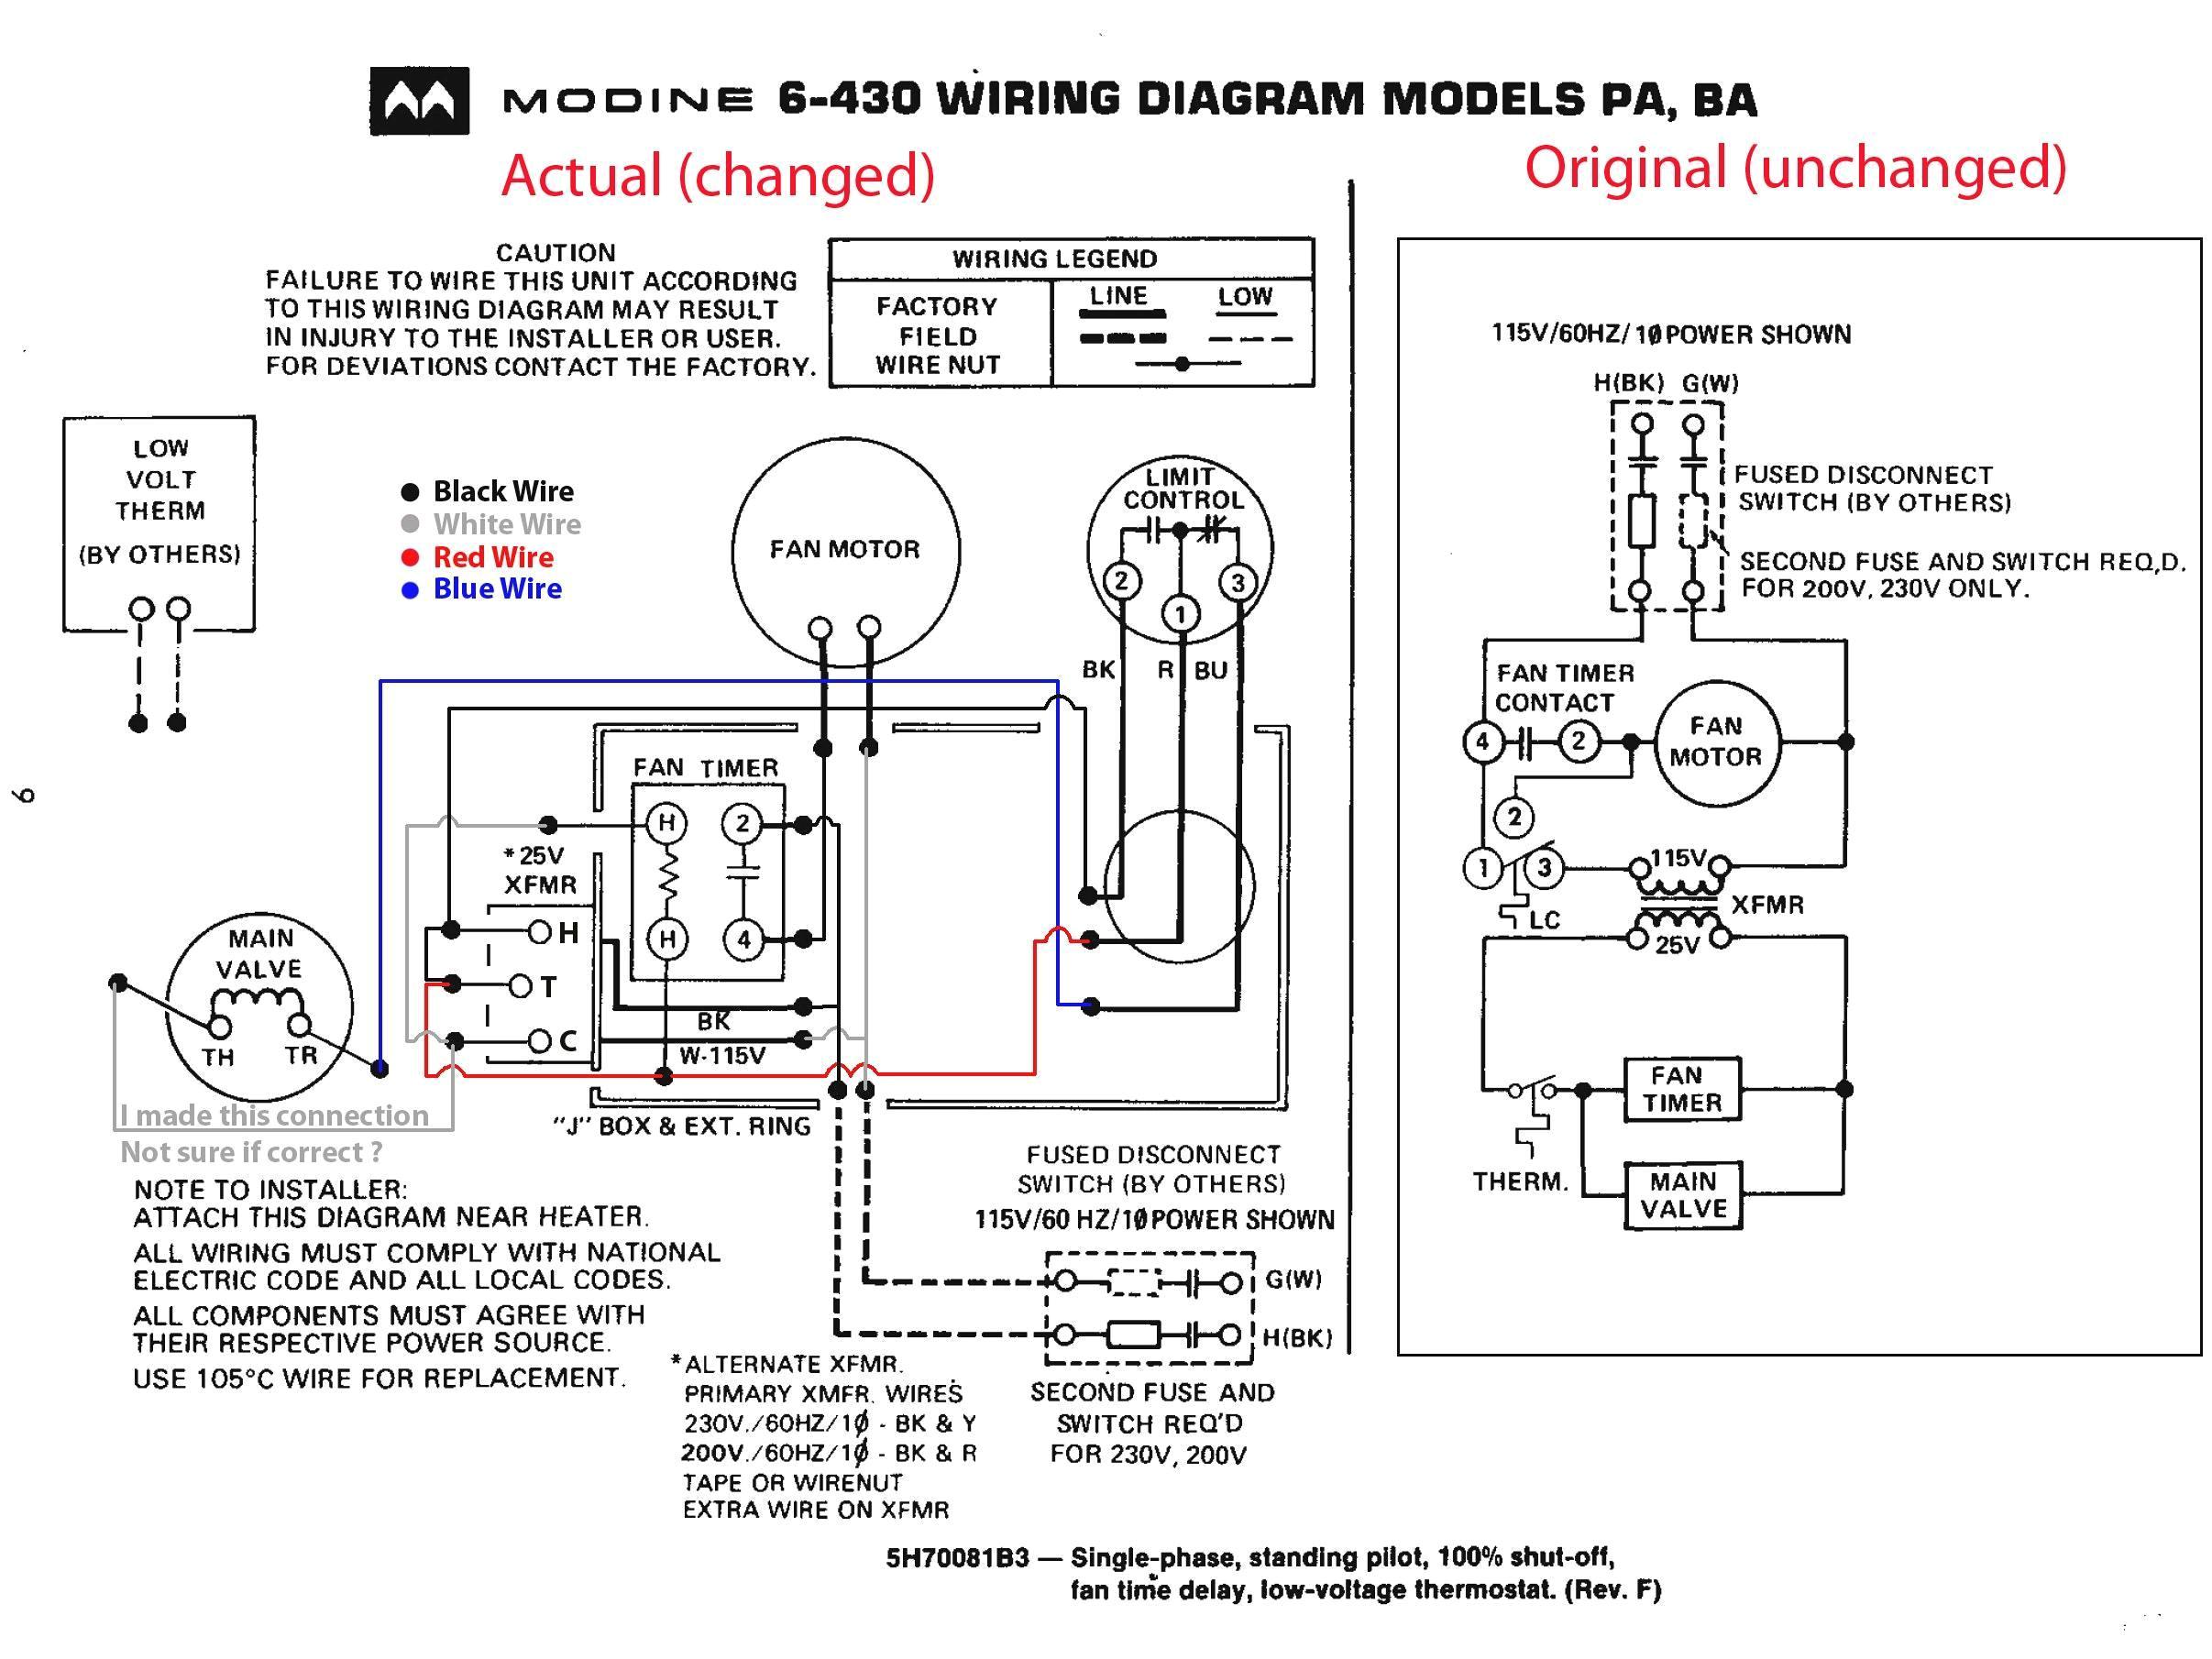 suburban model sw10de water heater wiring diagram rv at